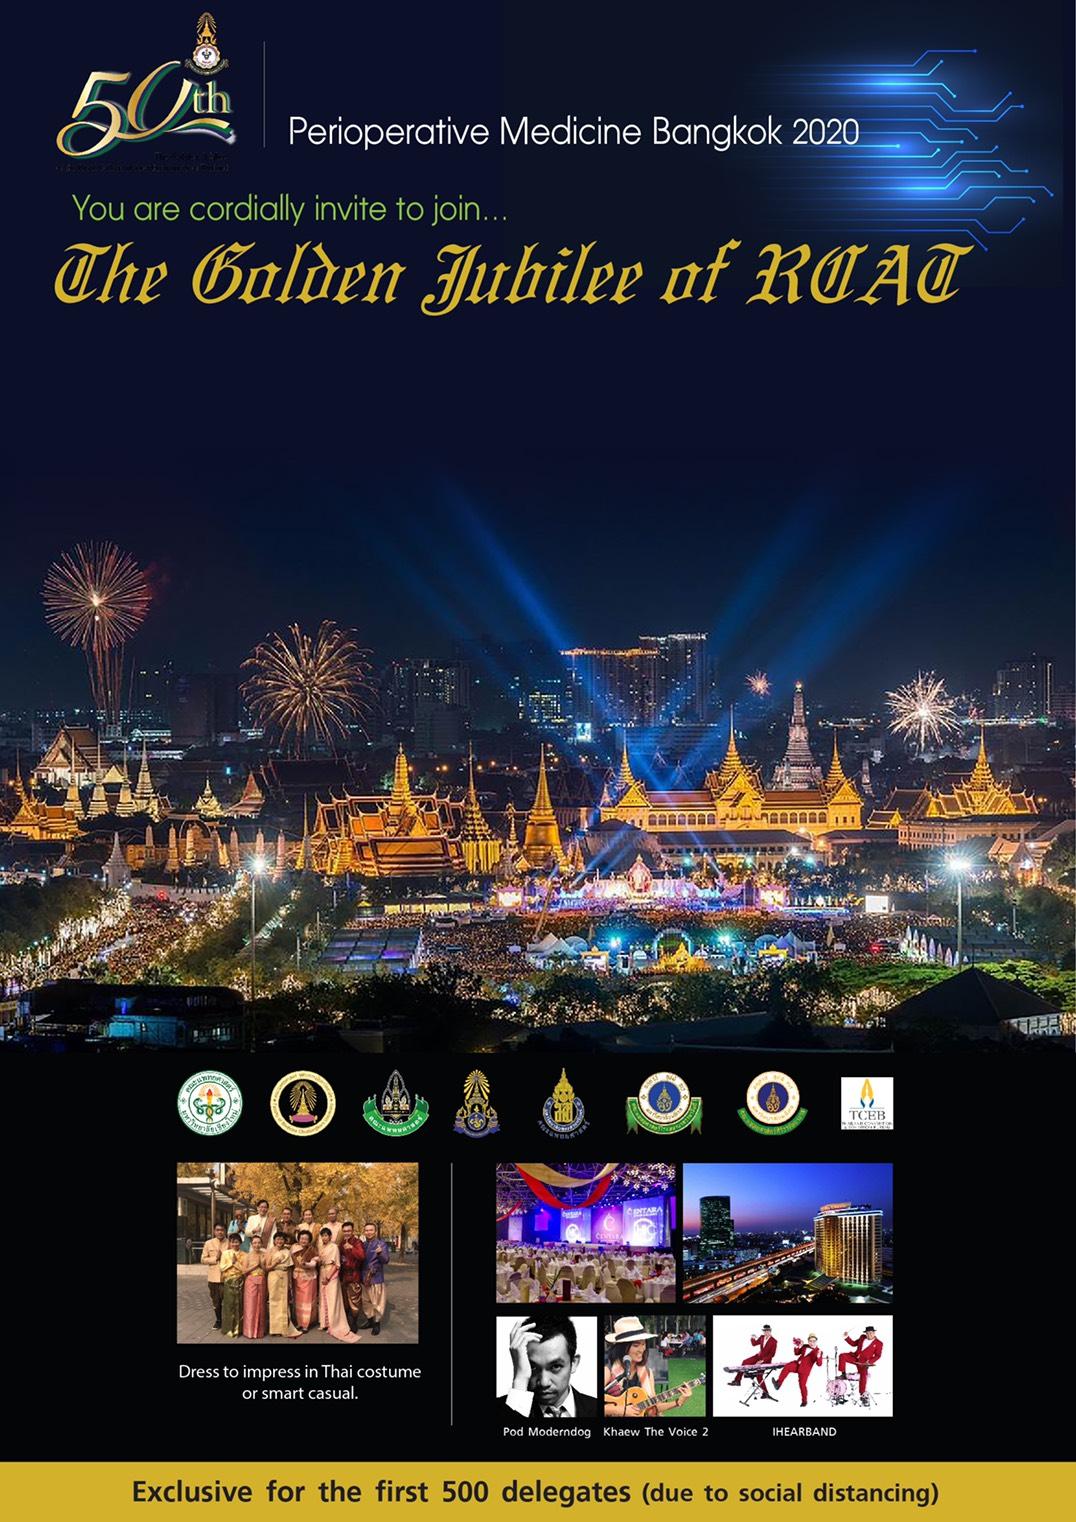 The Golden Jubilee of ROAD